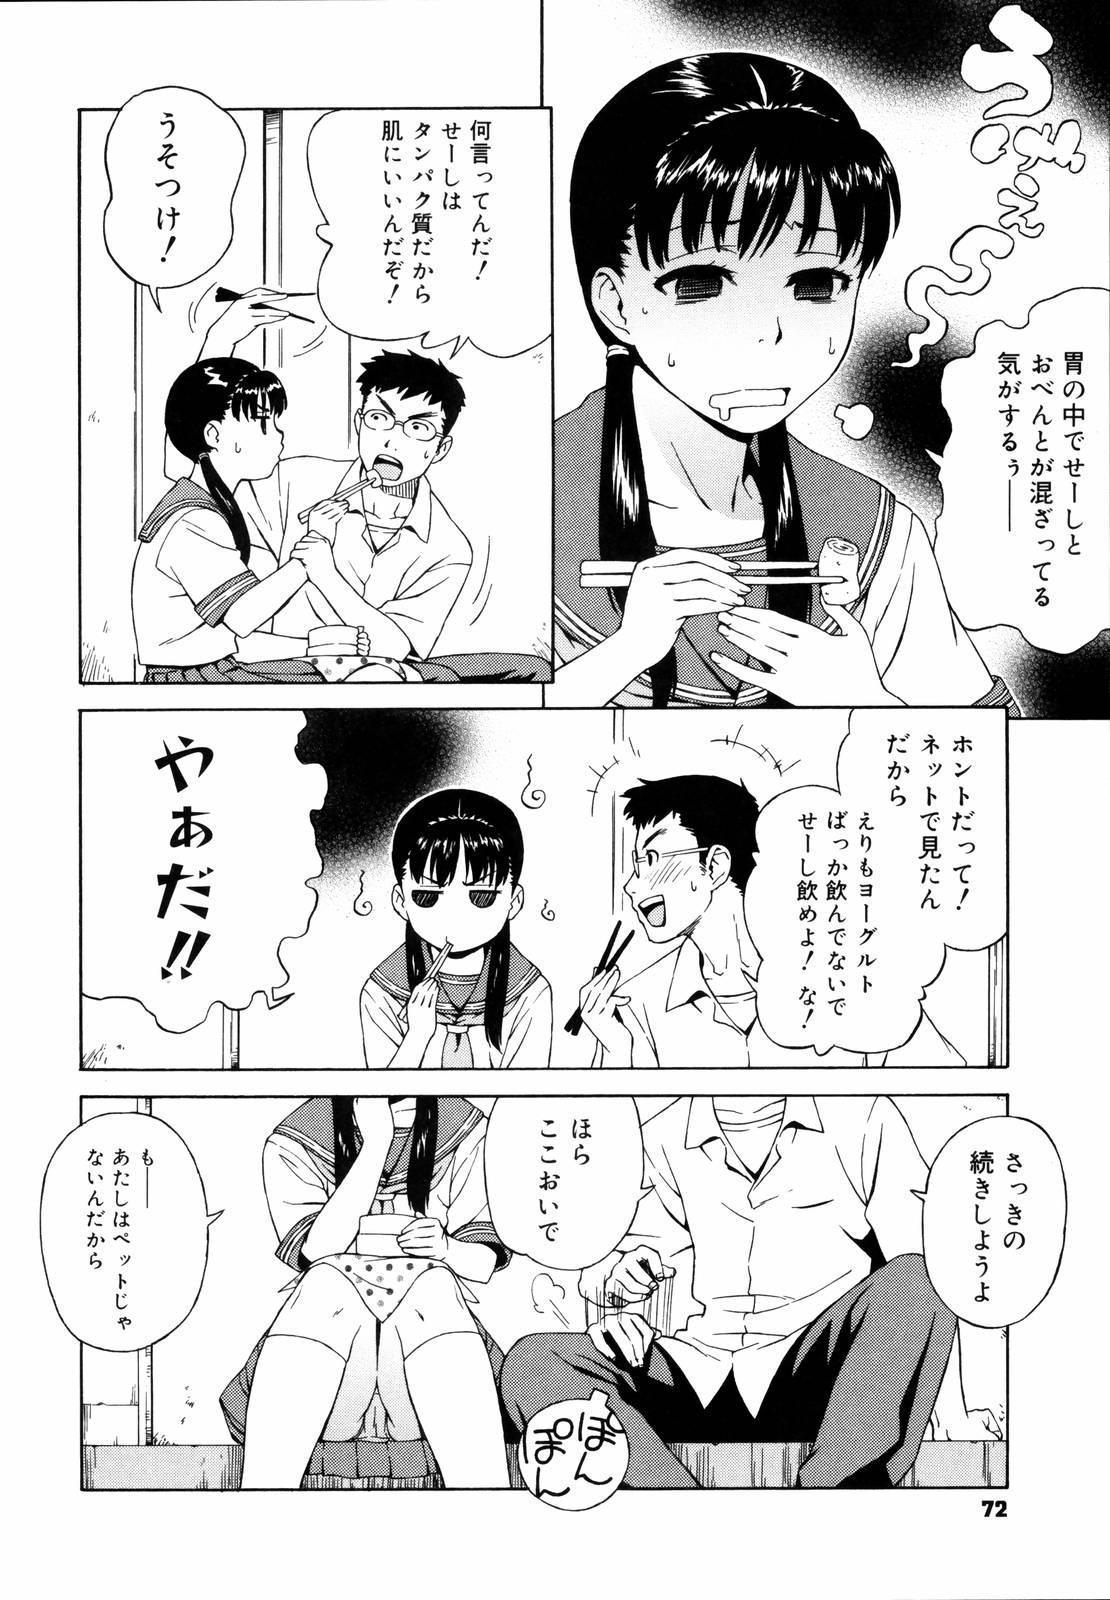 Shishunki wa Hatsujouki - Adolescence is a sexual excitement period. 73